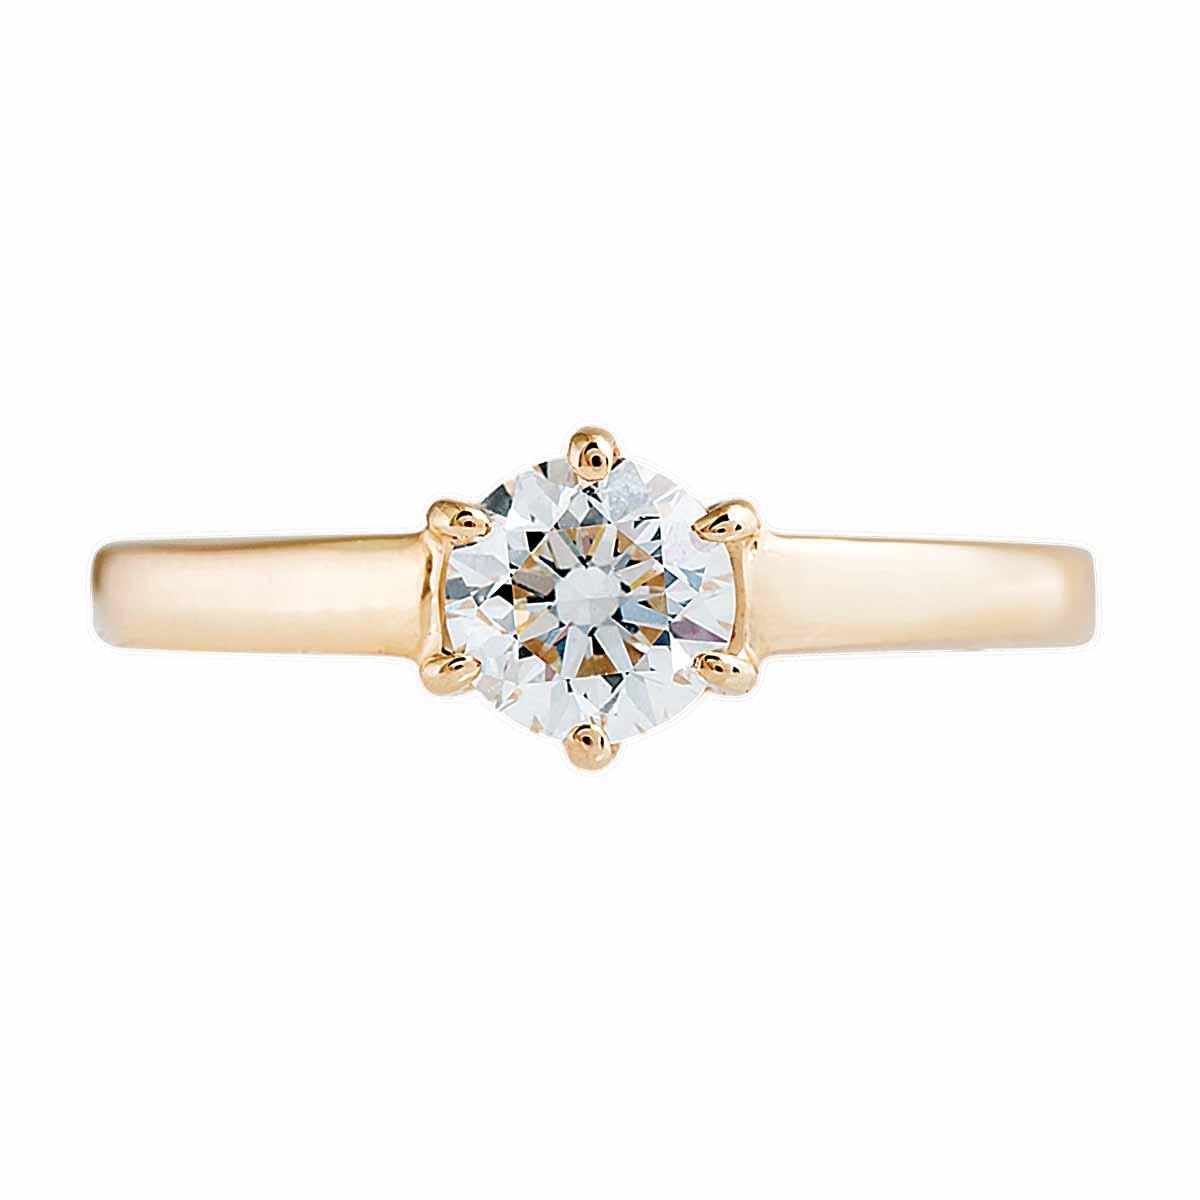 Vintage 0.70 CT Diamond Engagement Ring